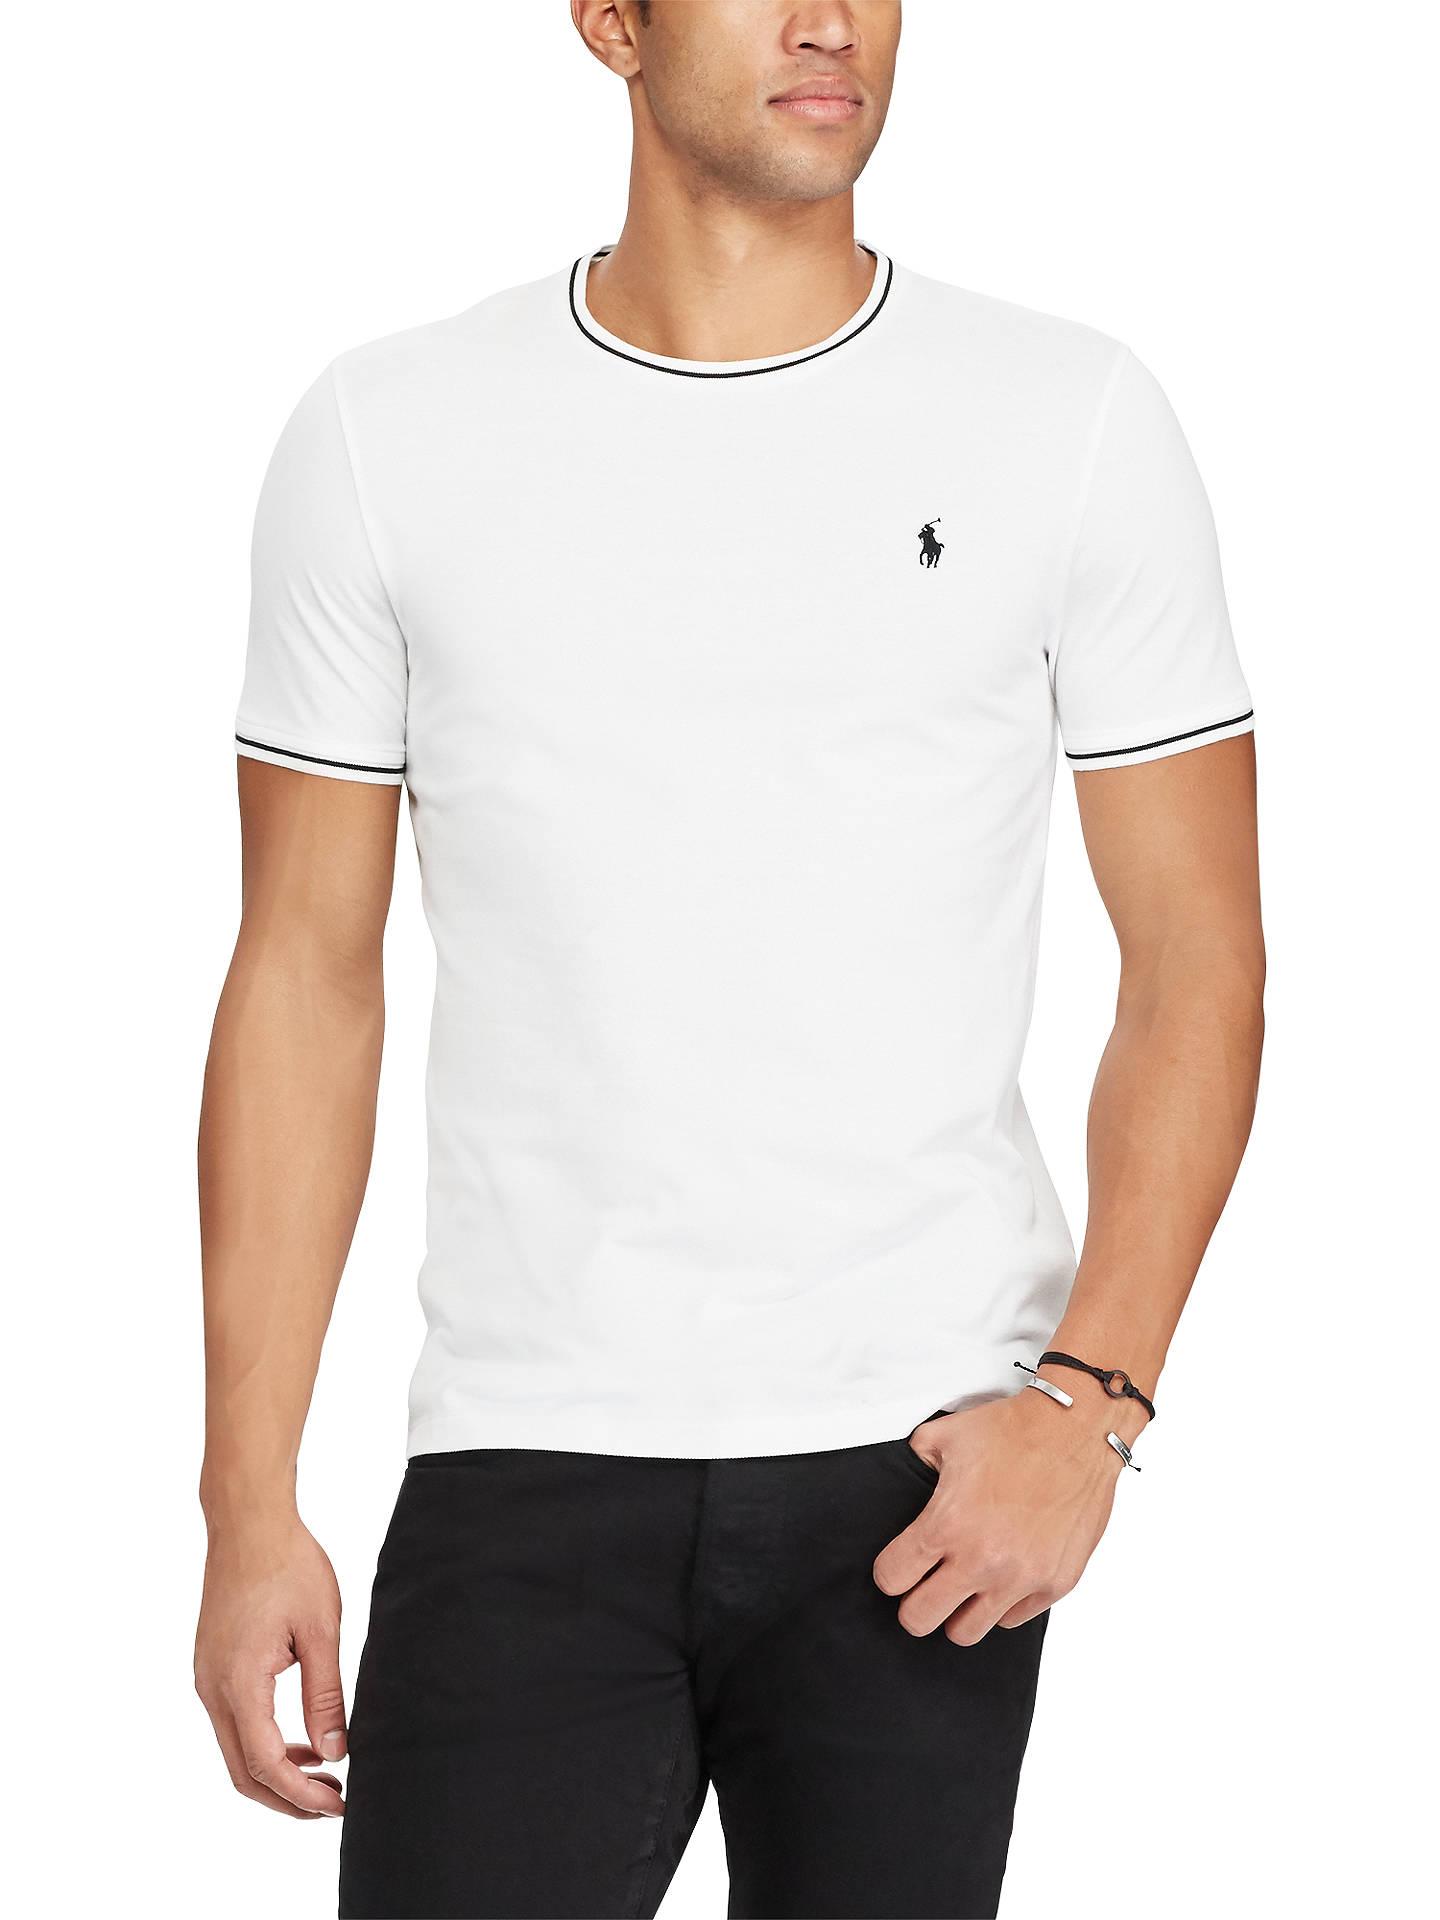 BuyPolo Ralph Lauren Short Sleeve Crew Neck T-Shirt 8e3e03e7260b